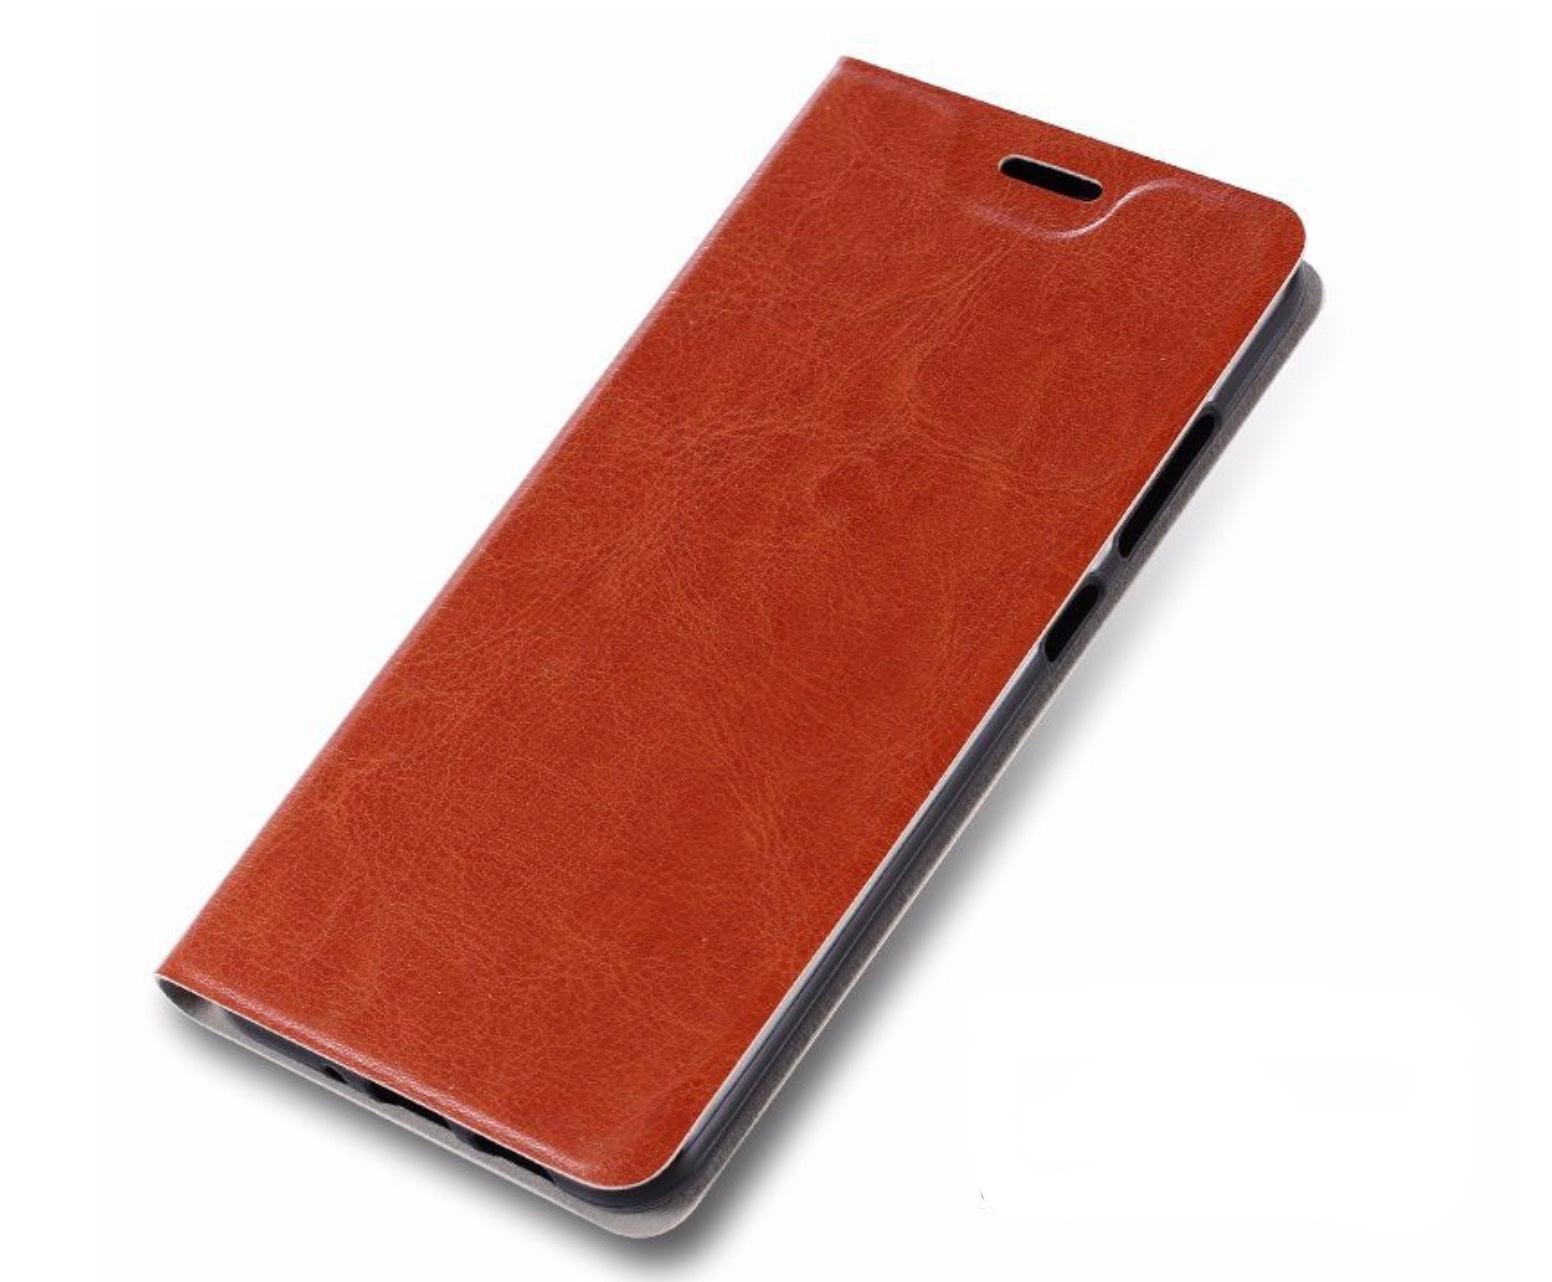 цена на Чехол-книжка MyPads для HTC One ME Dual Sim на жёсткой металлической основе коричневый